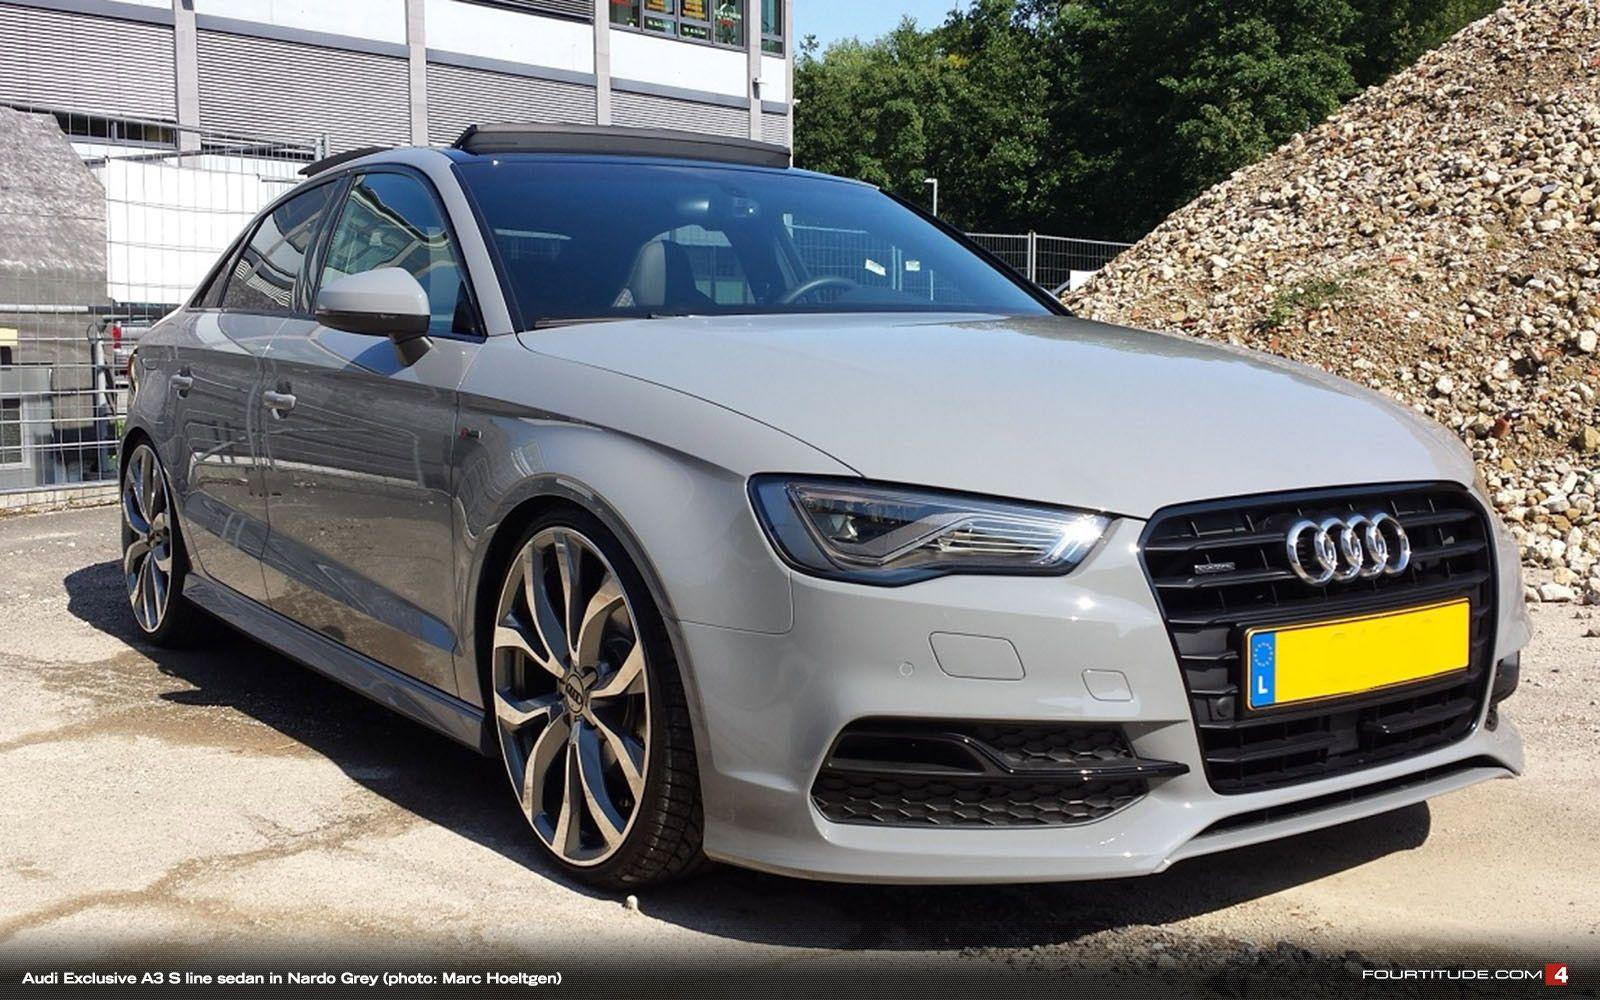 Audi Exclusive Nardo Grey A3 S Line Sedan Be Jealous Be Very